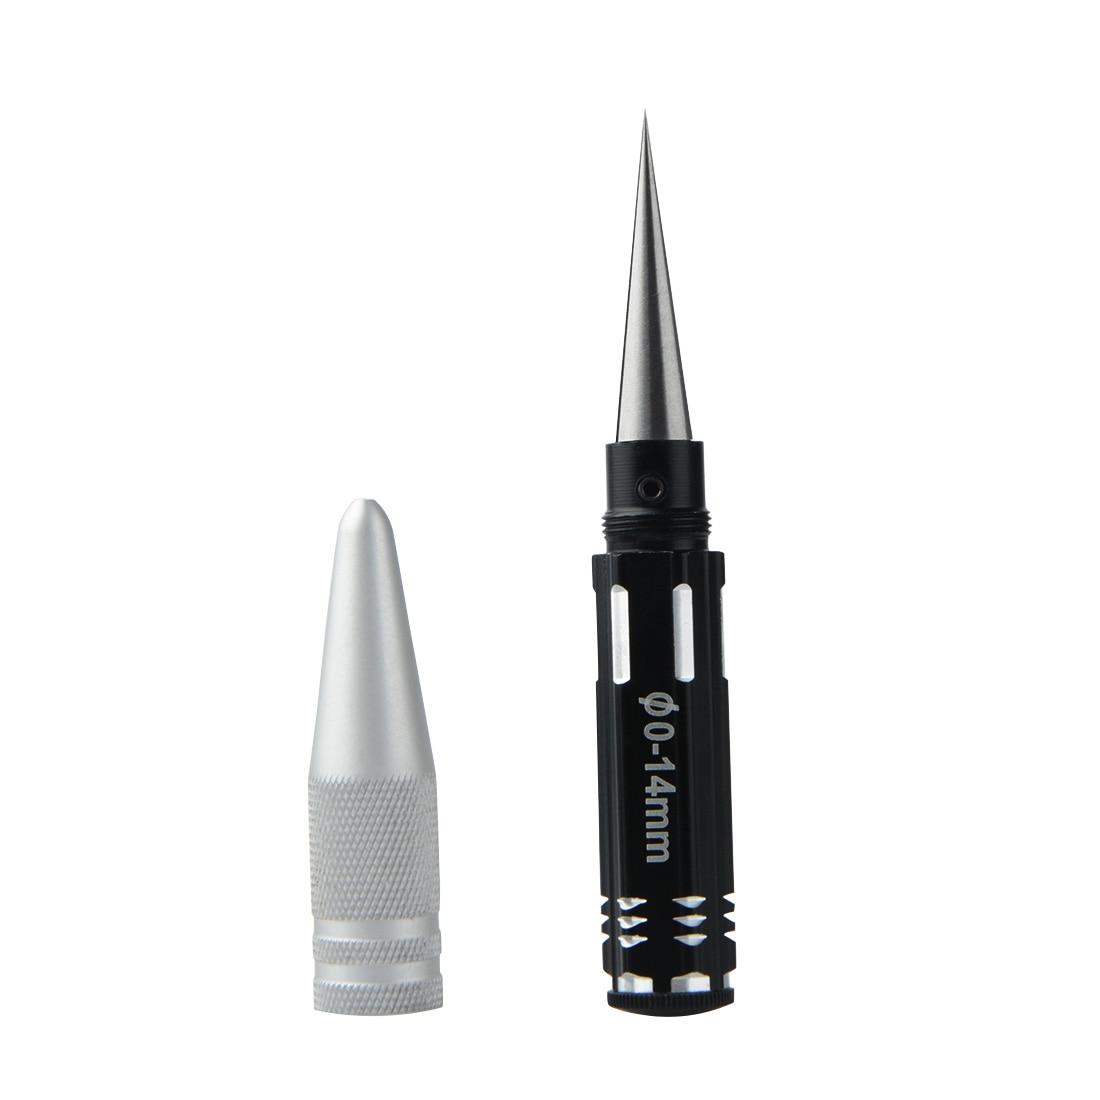 Universal  0-14mm Steel Hole Expanding/Opener Drill Bit Professional Reamer Installation Kit Model Tools P0.1